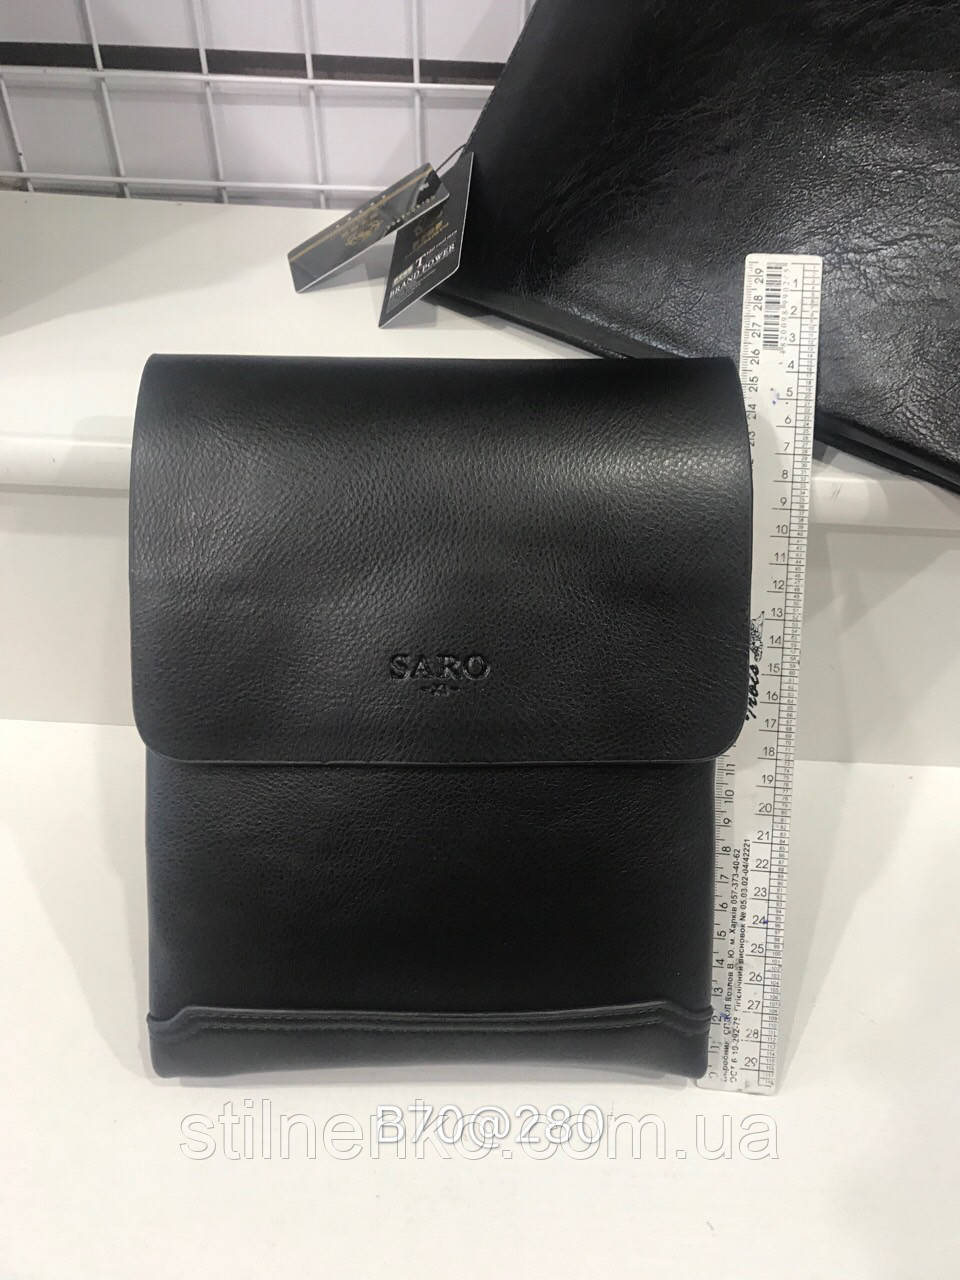 Мужская сумка SARO